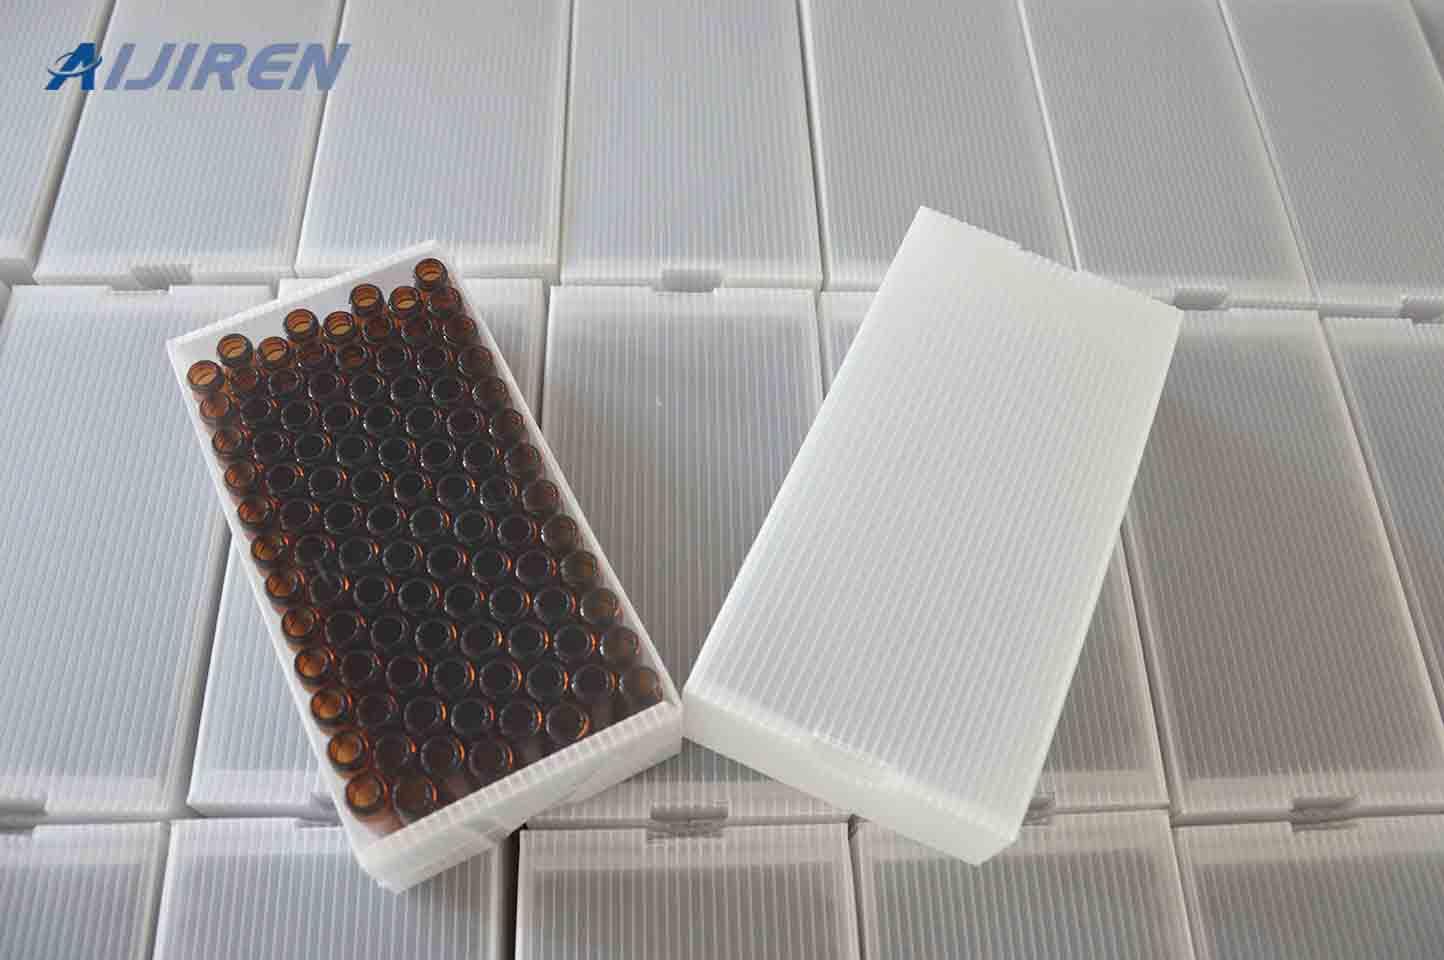 20ml headspace vial13mm Amber Glass Vial